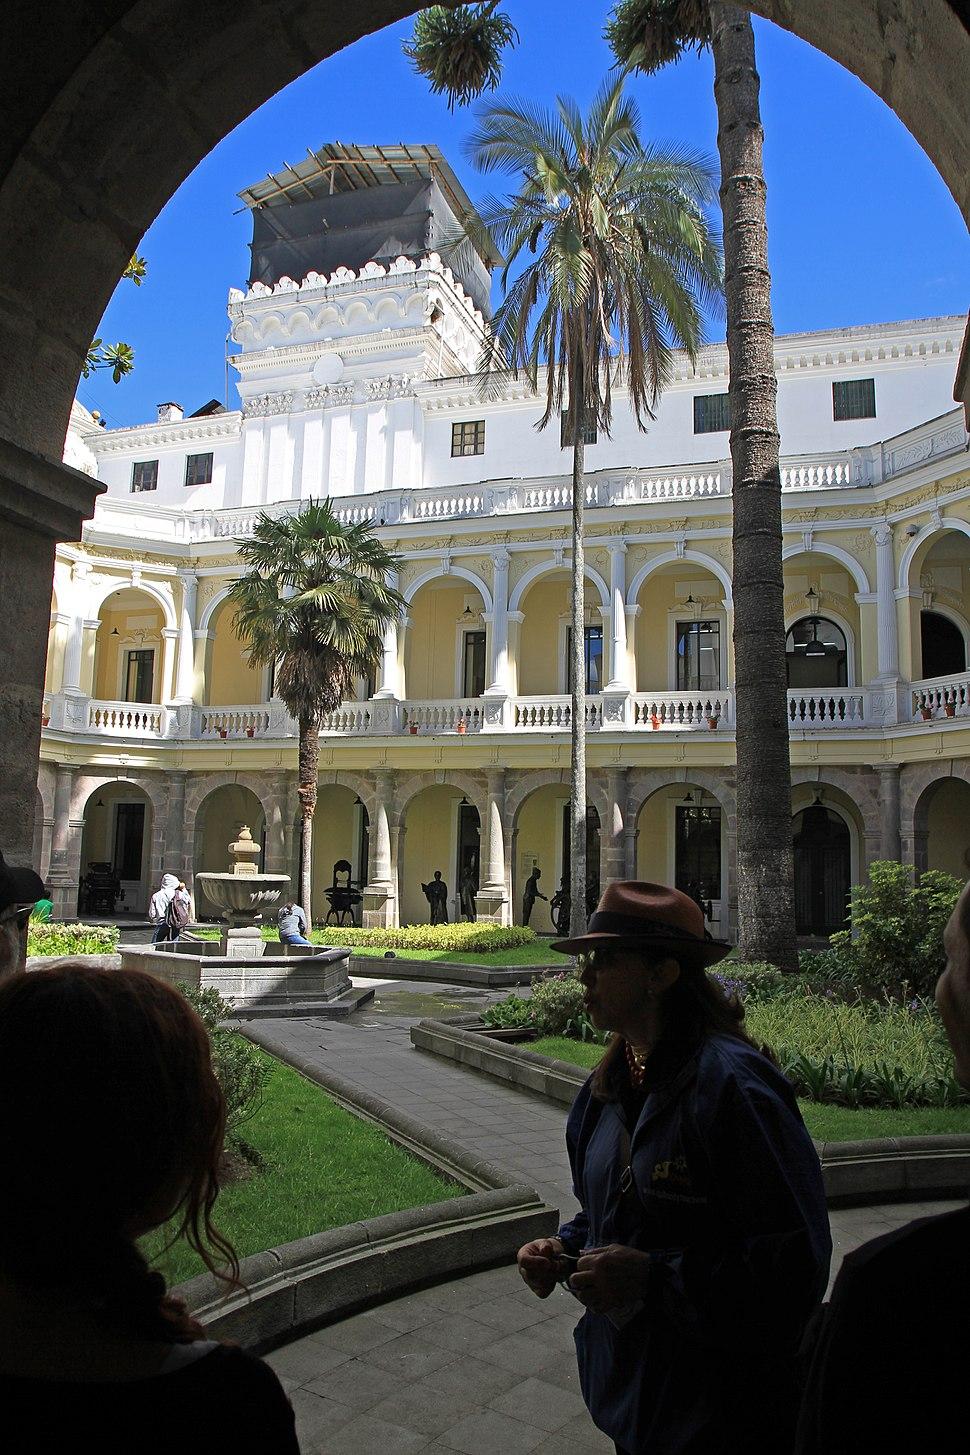 Ama la Vida - Flickr - Periodistas espa%C3%B1oles recorren Centro Hist%C3%B3rico de Quito 2014 (14476342297)